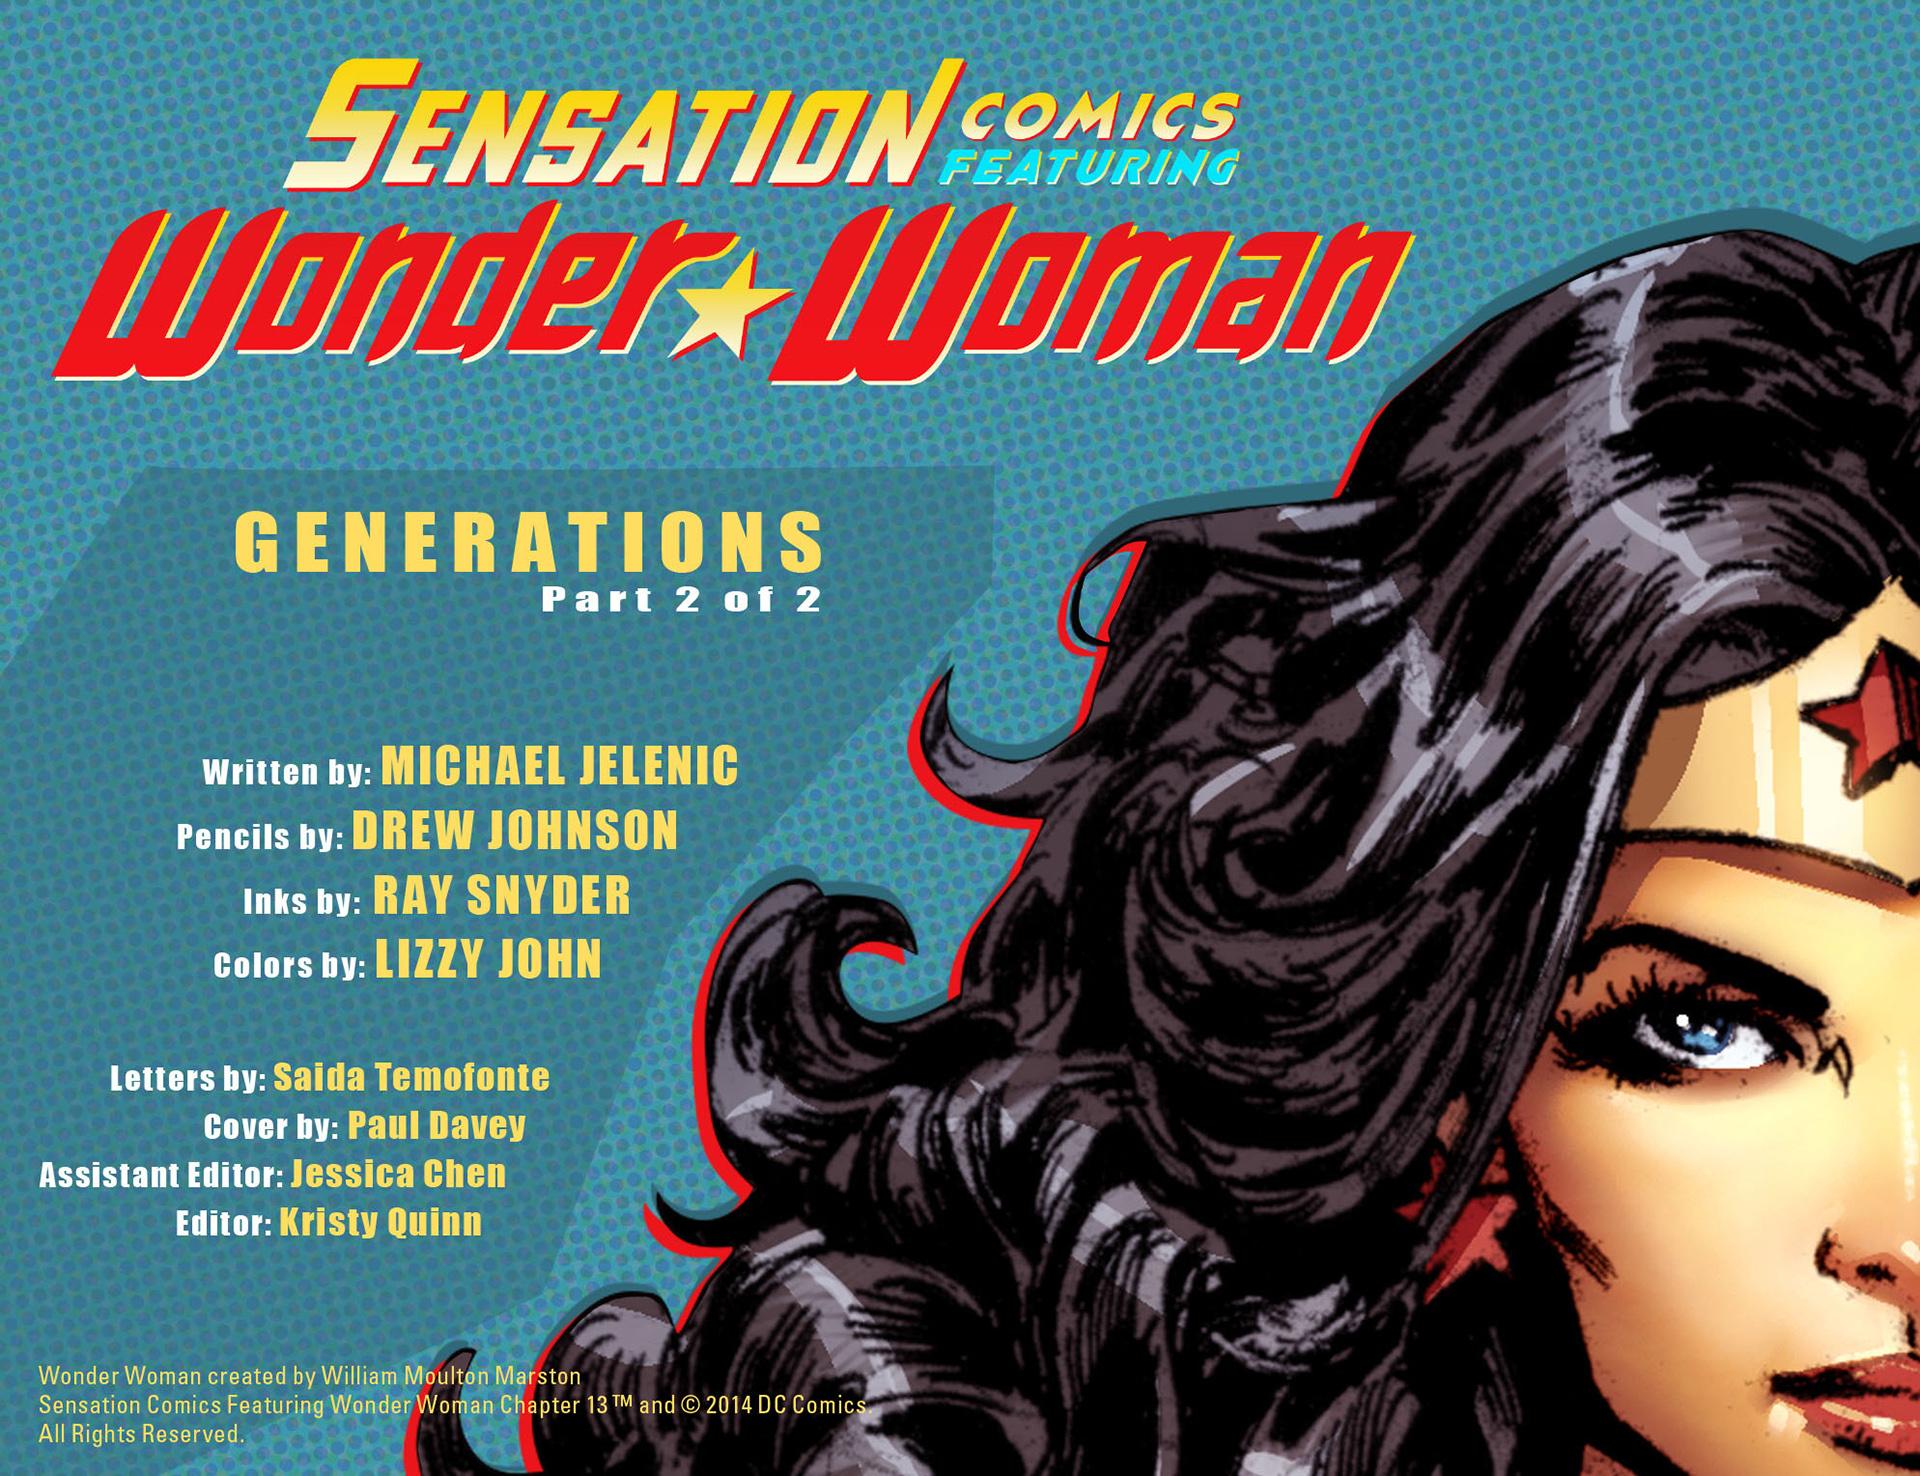 Read online Sensation Comics Featuring Wonder Woman comic -  Issue #13 - 2